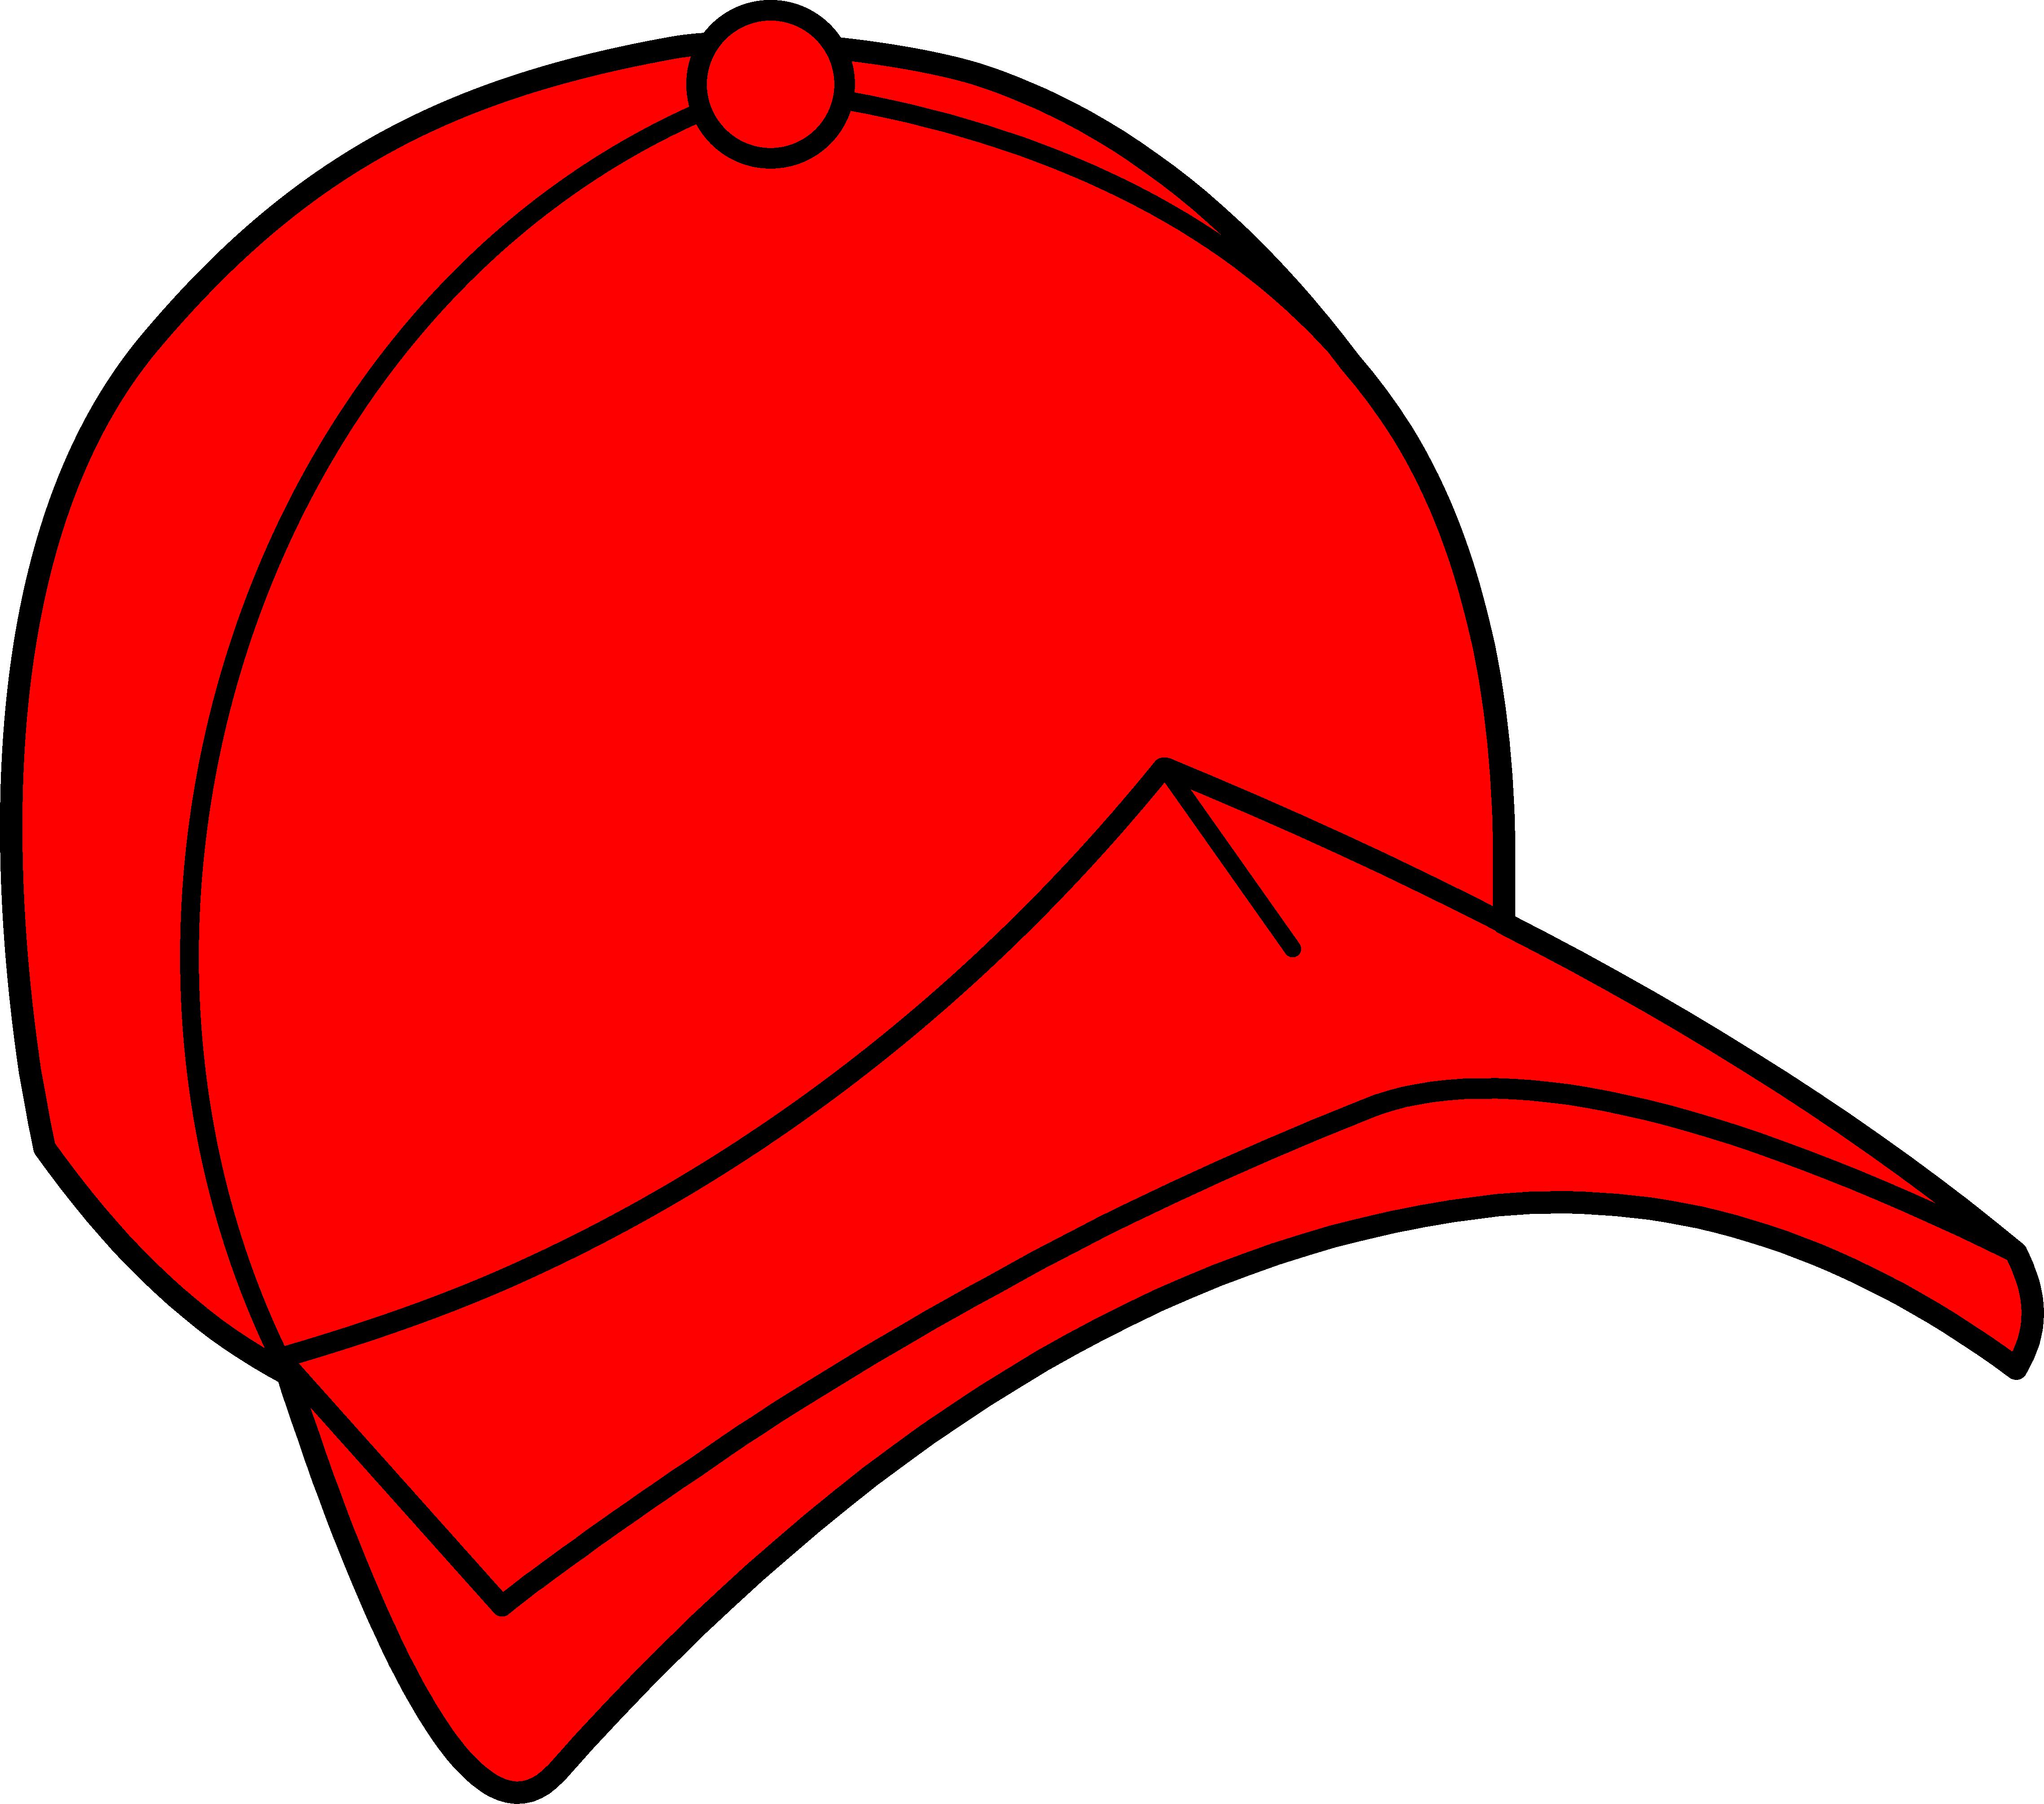 red cap clipart rh worldartsme com red clipart frames red clipart heart